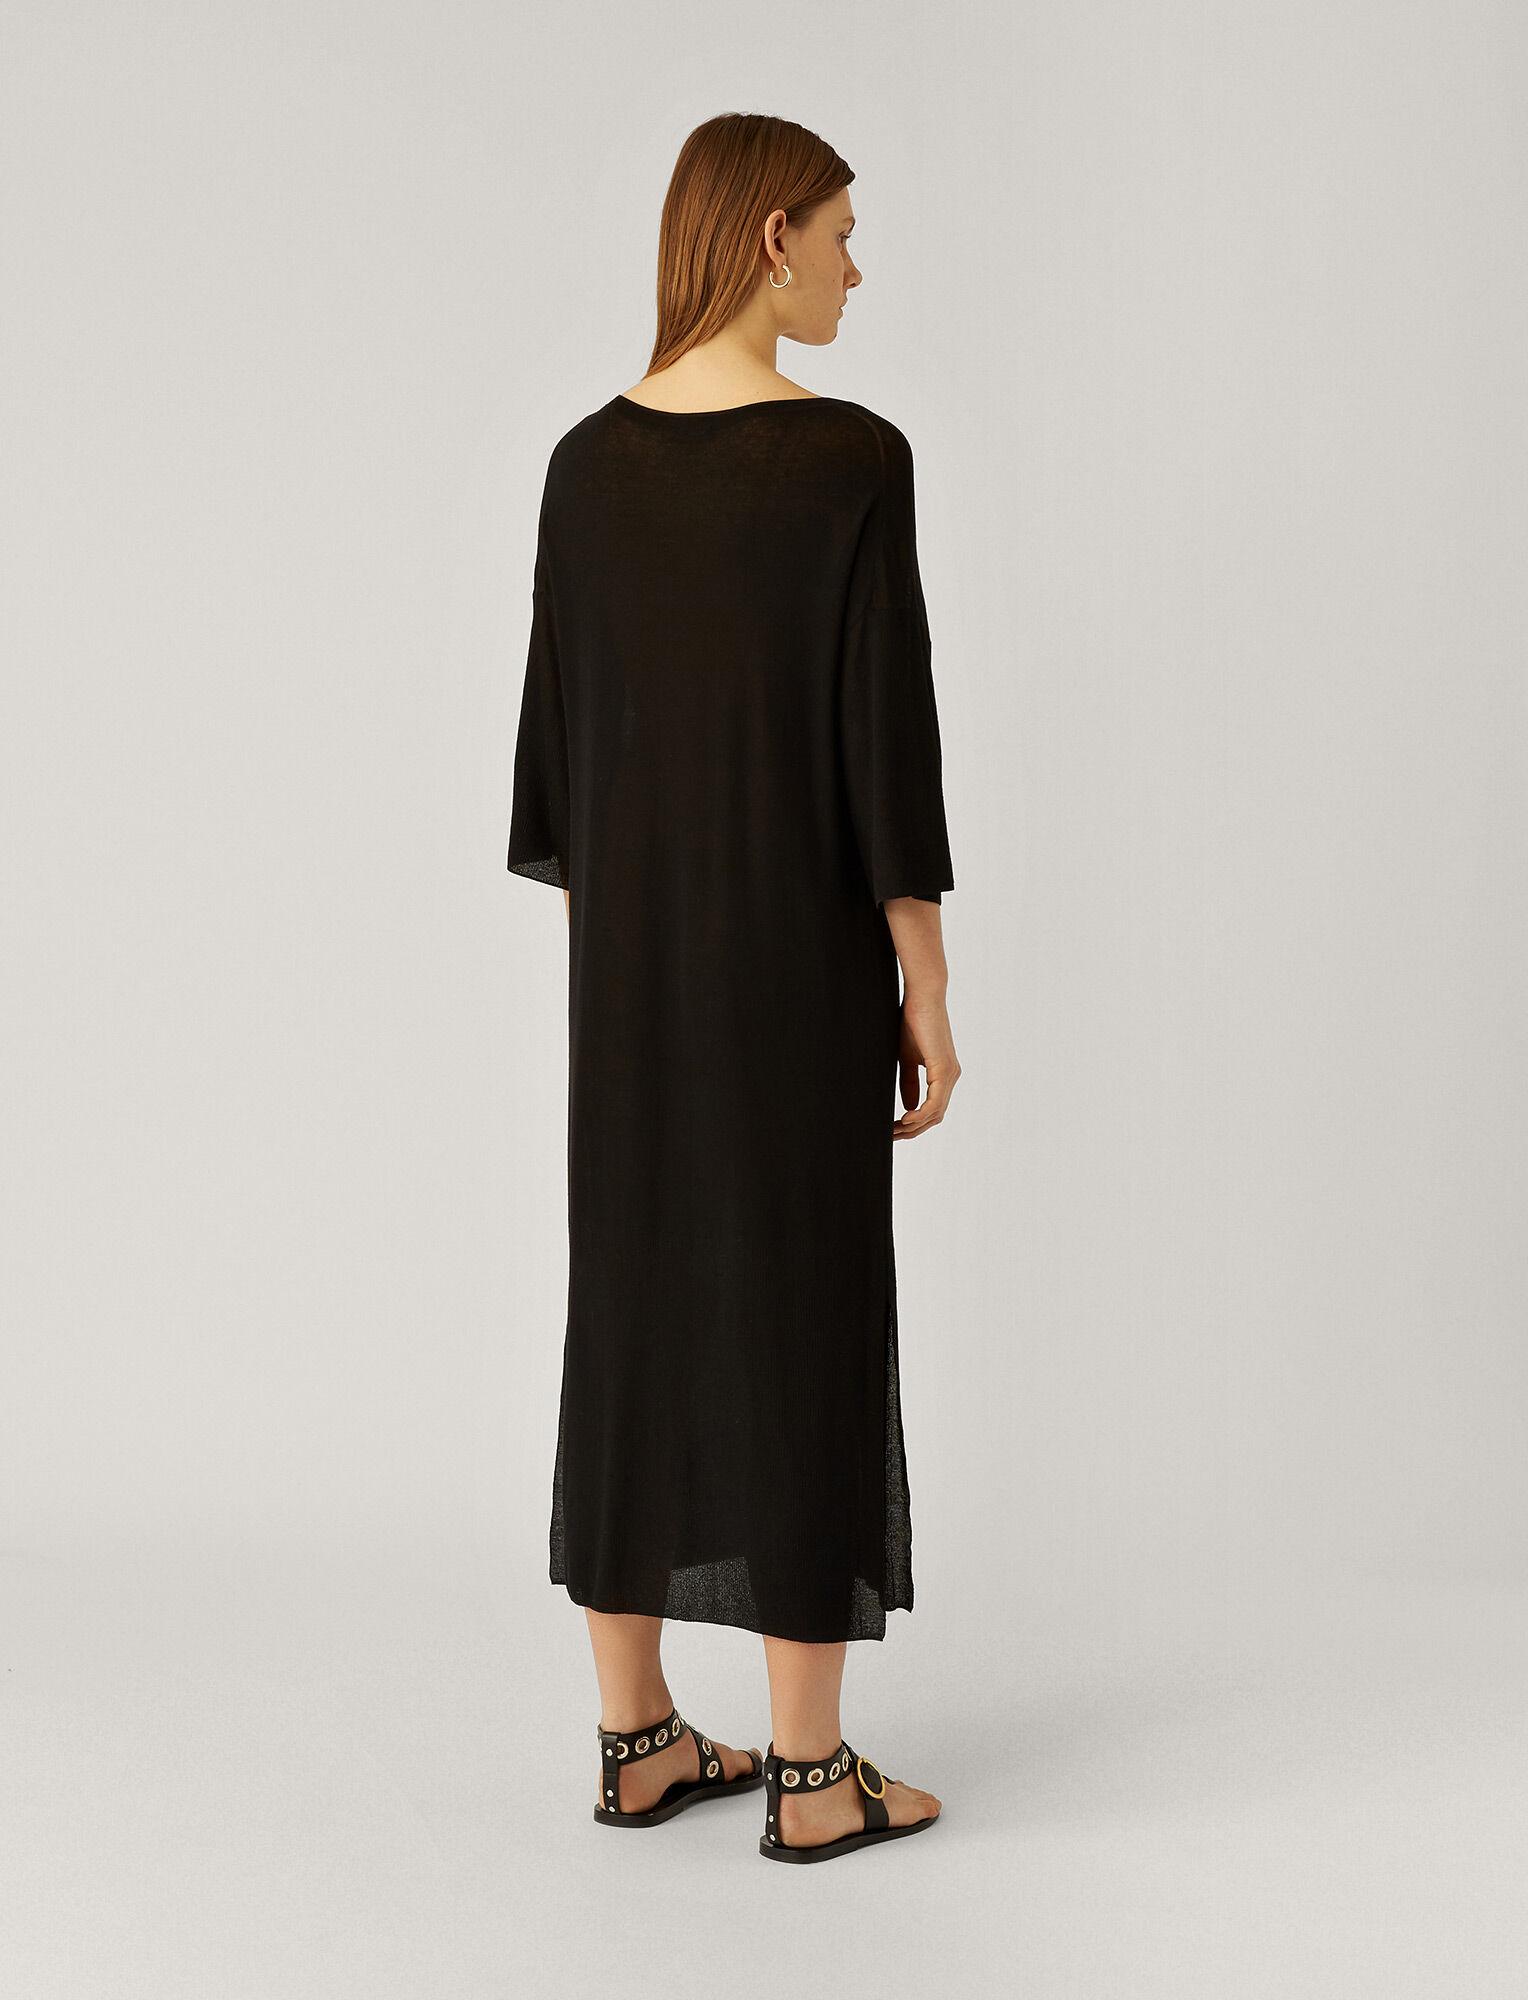 Joseph, Darline Sheer Cotton Dress, in BLACK